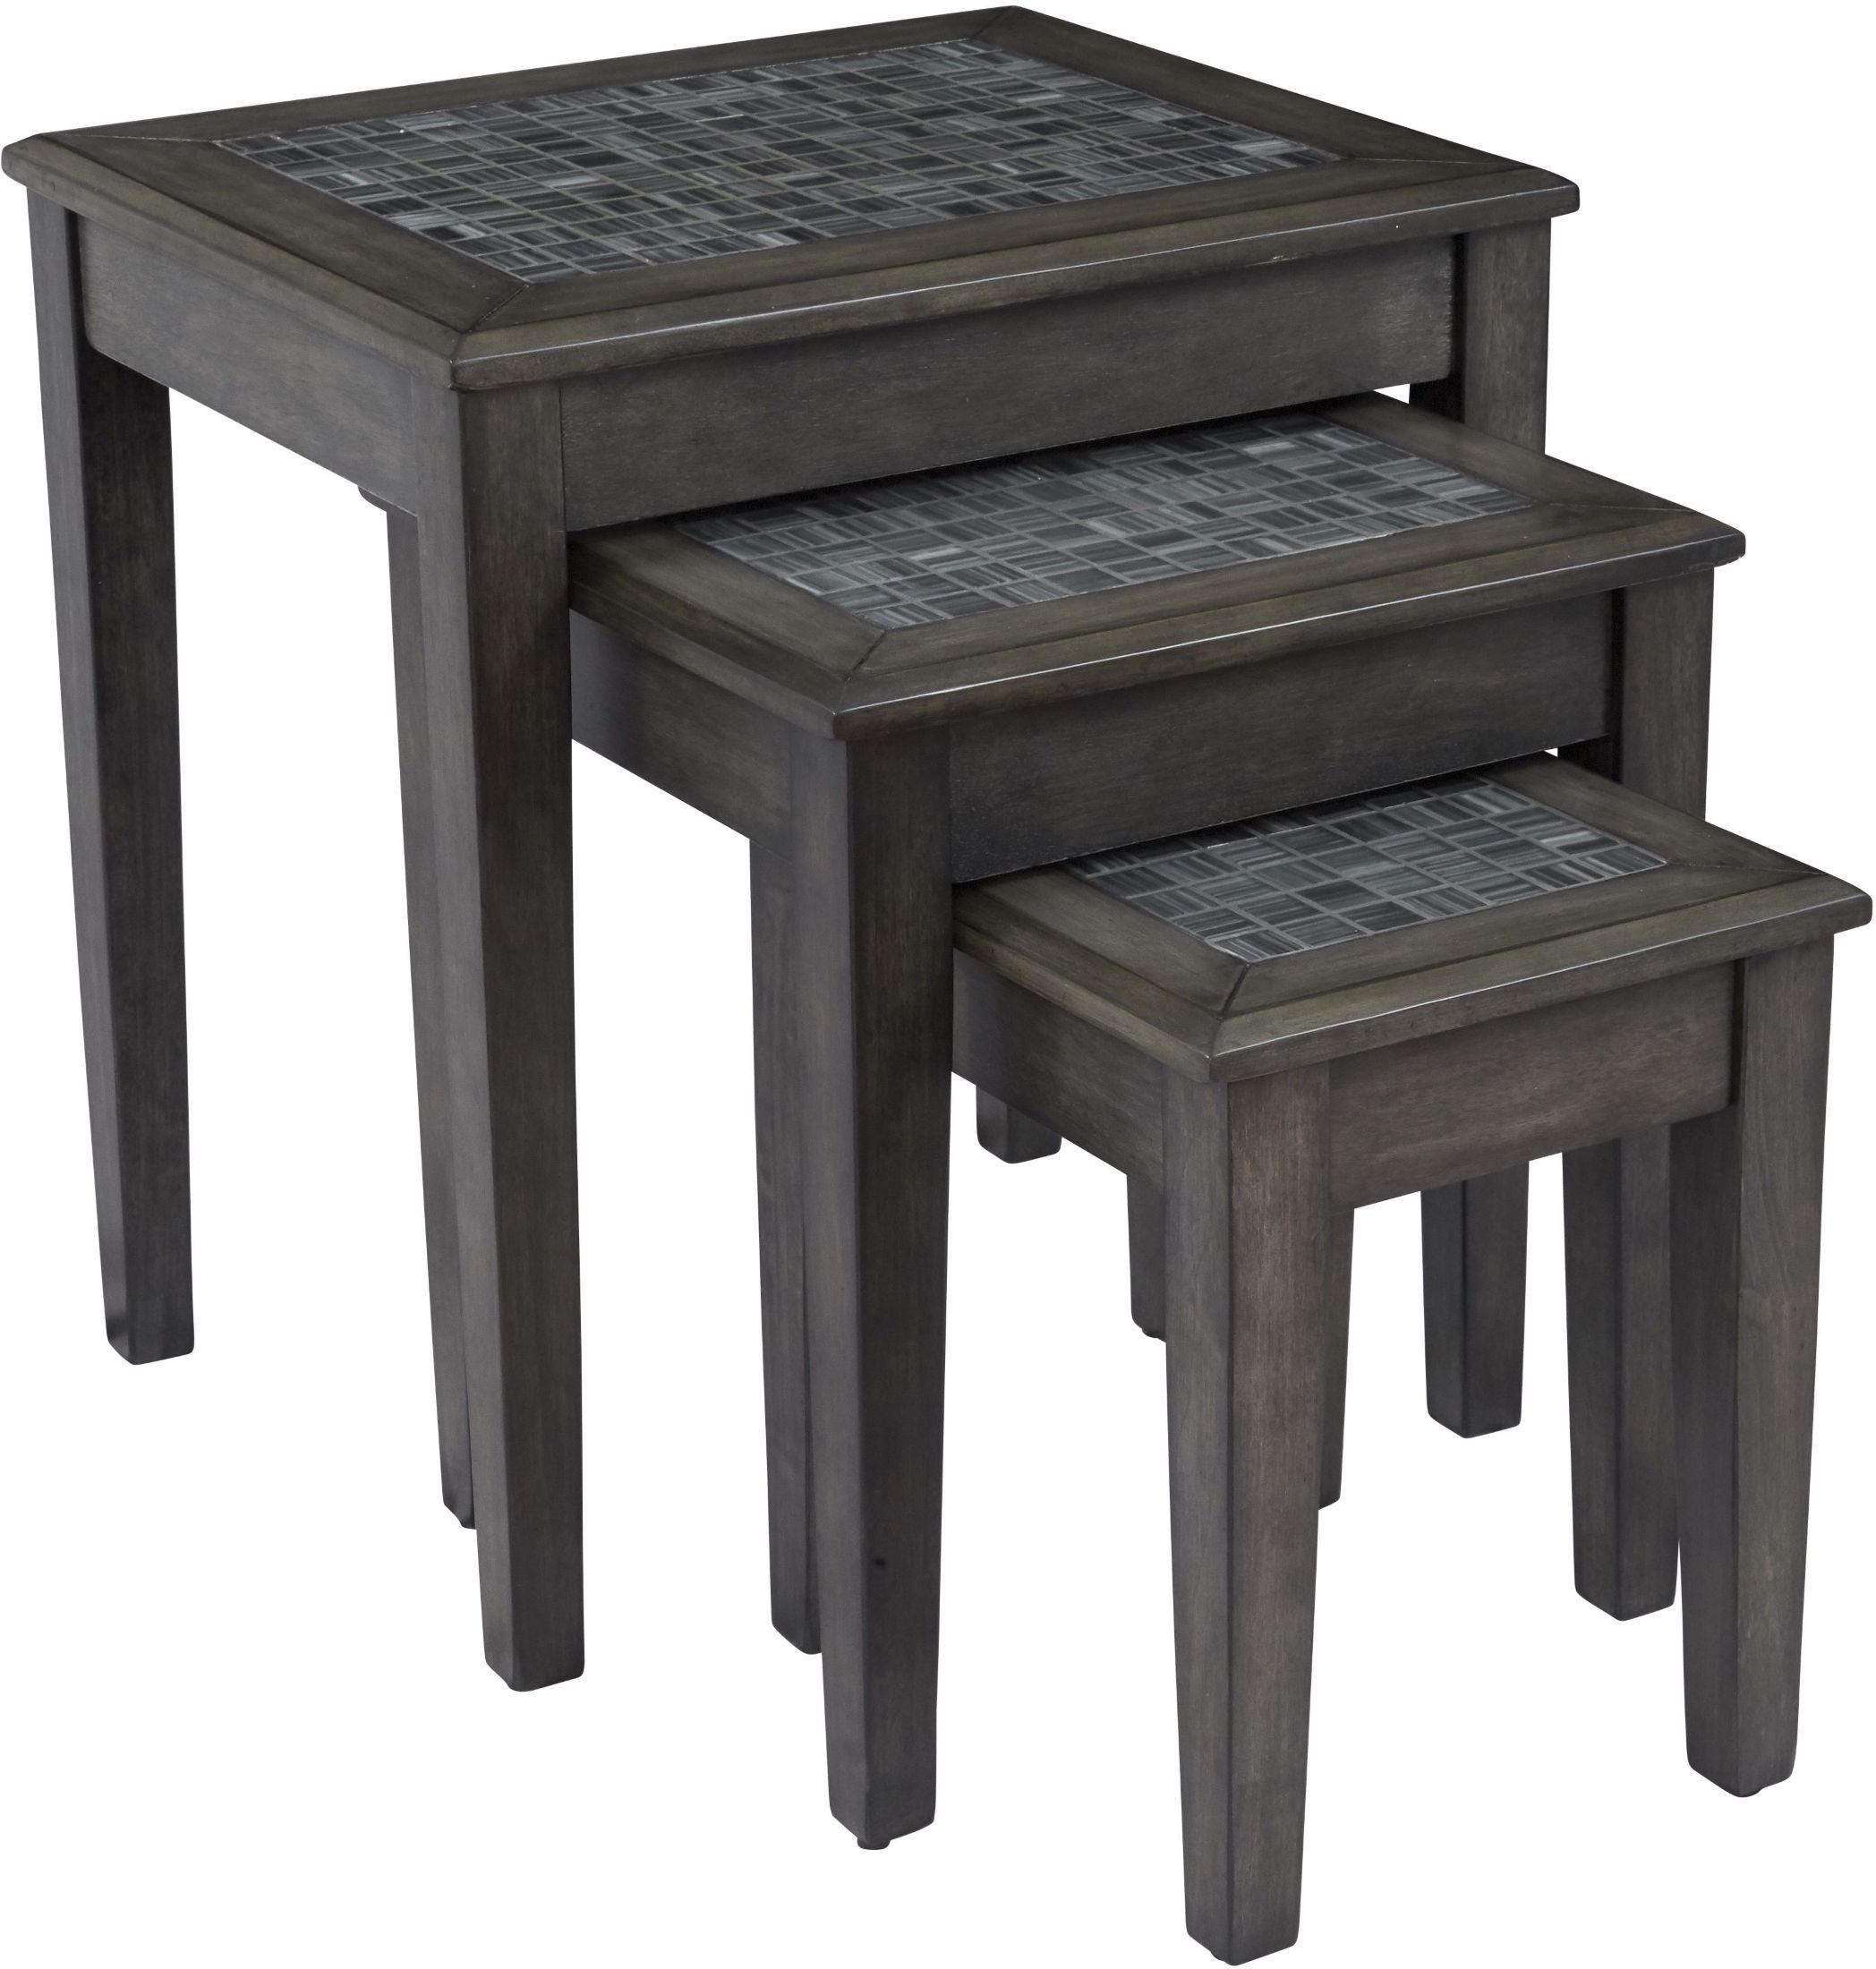 White Zinnia Nesting Tables Set Of 3: Grey Mosaic Nesting Tables Set Of 3 From Jofran